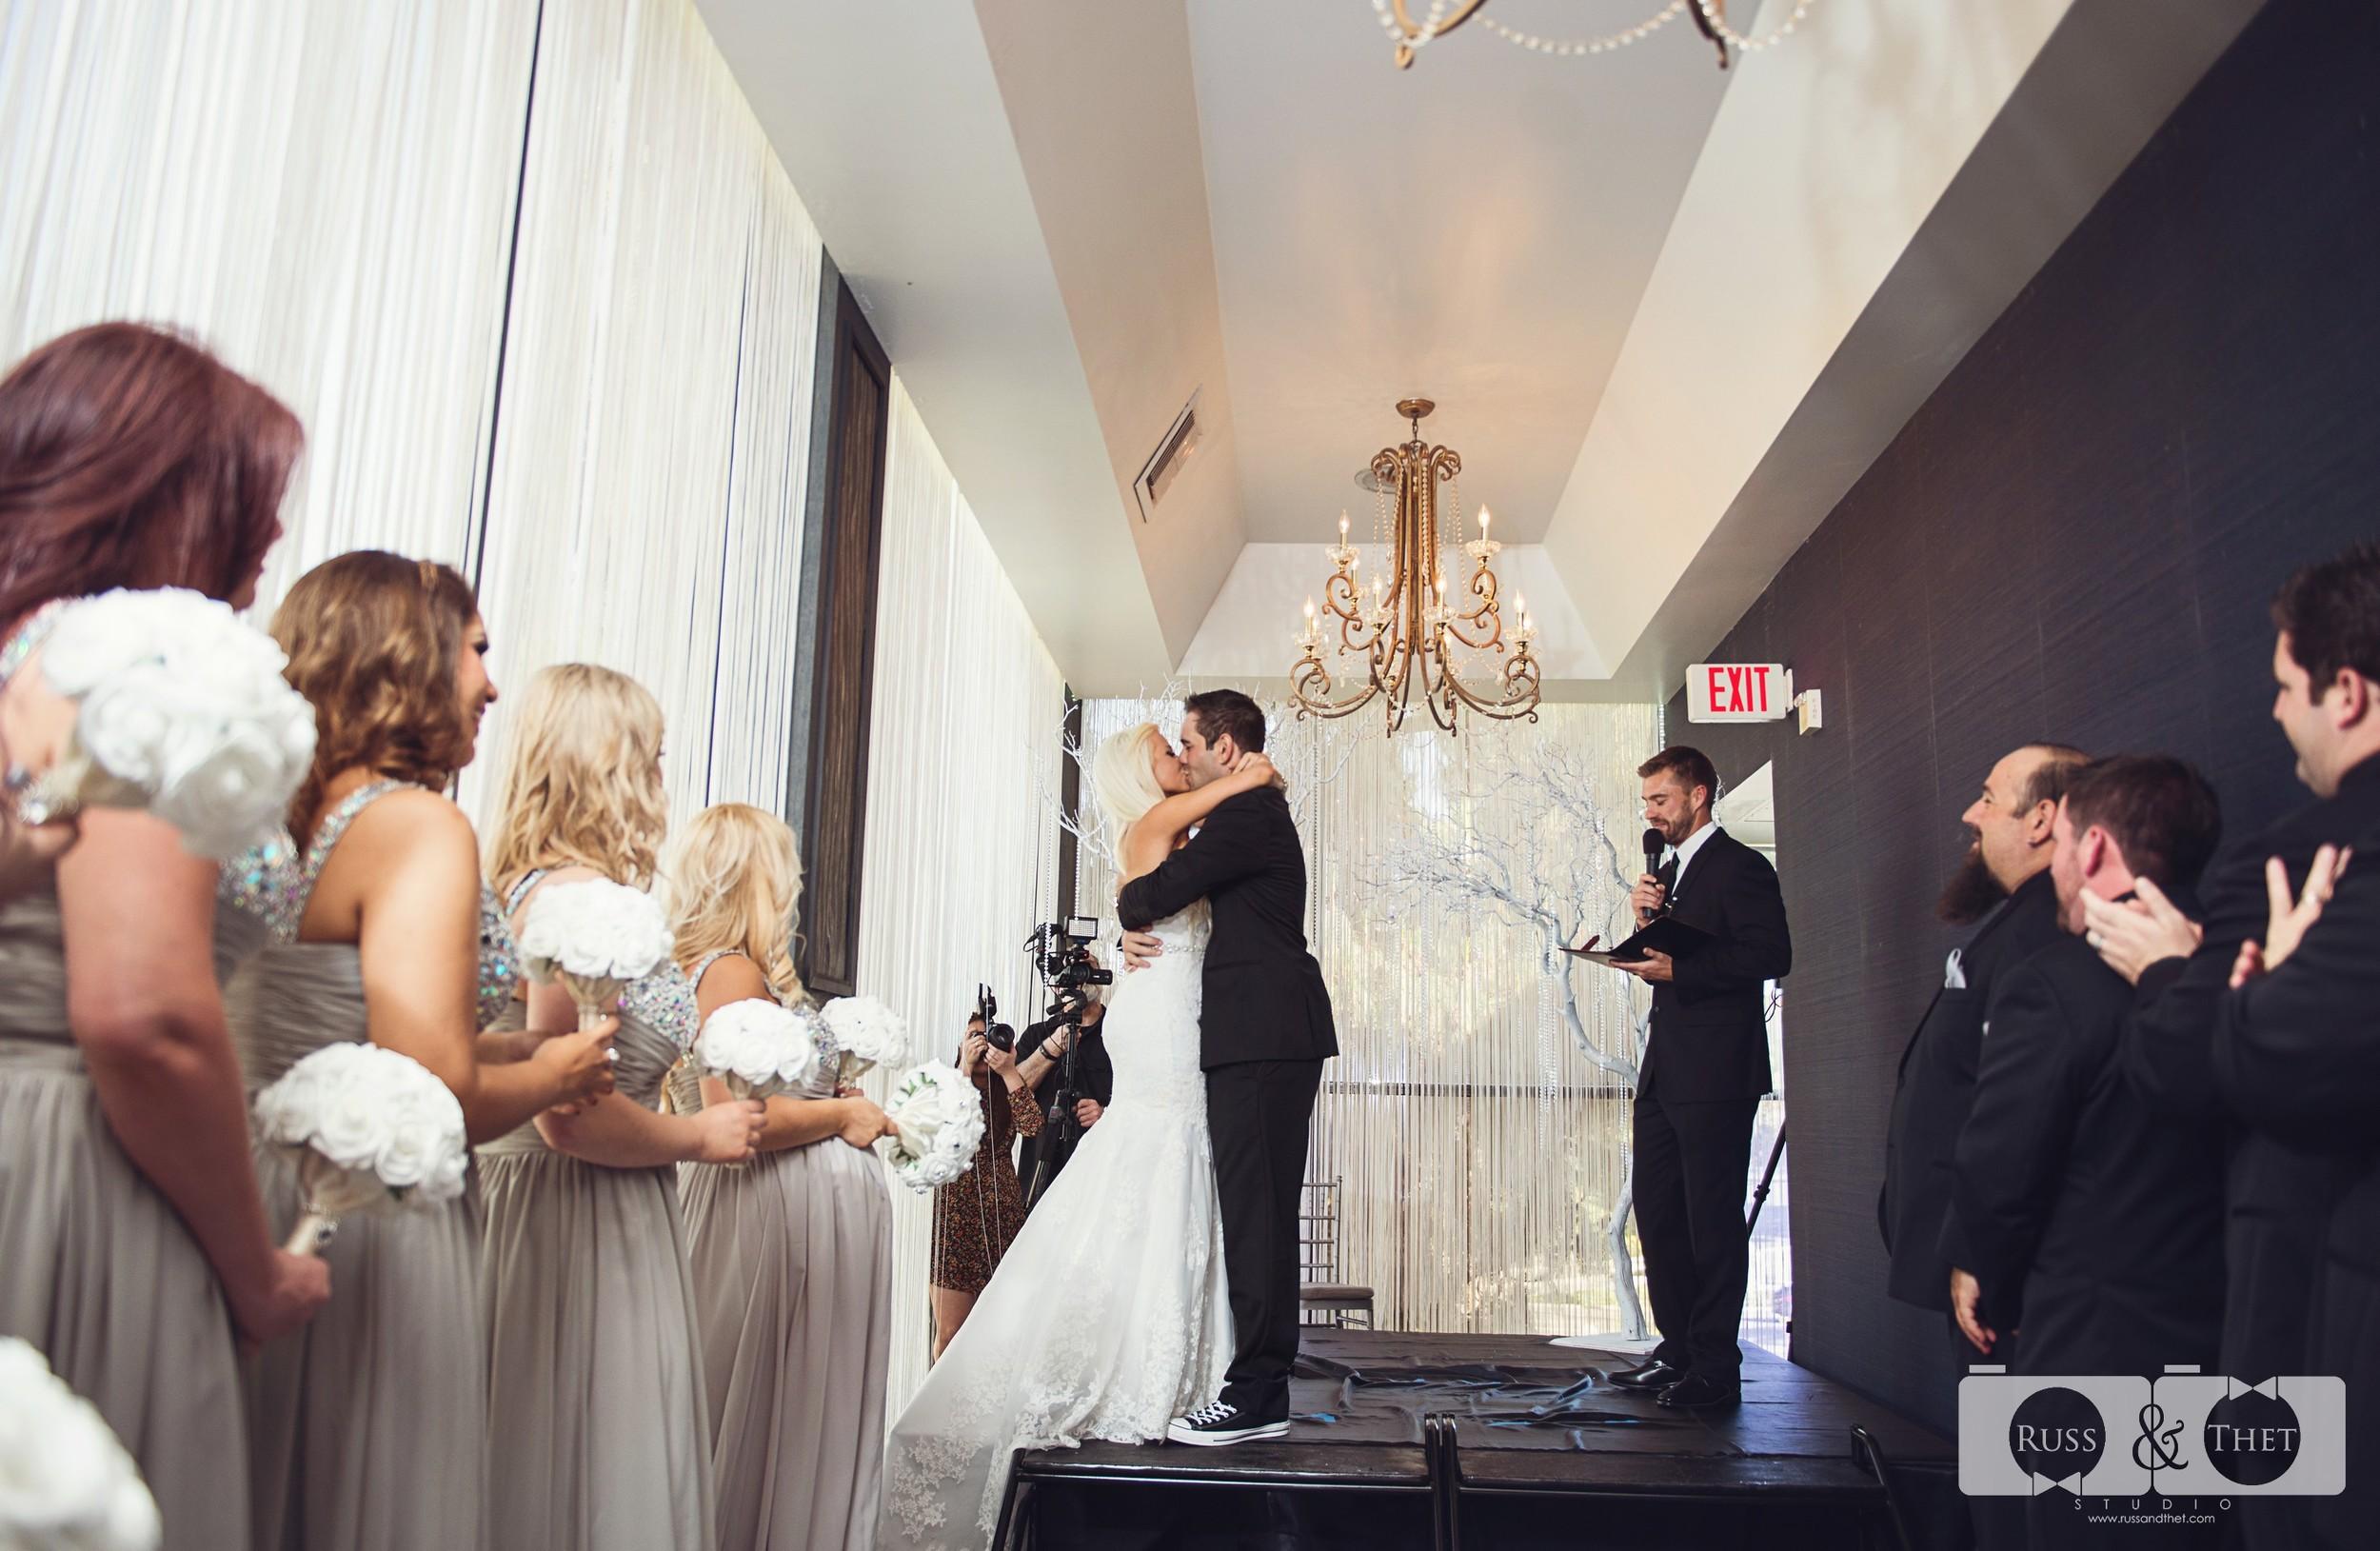 Jon&Kimee-The-Hills-Hotel-Wedding-Photographer (57).jpg